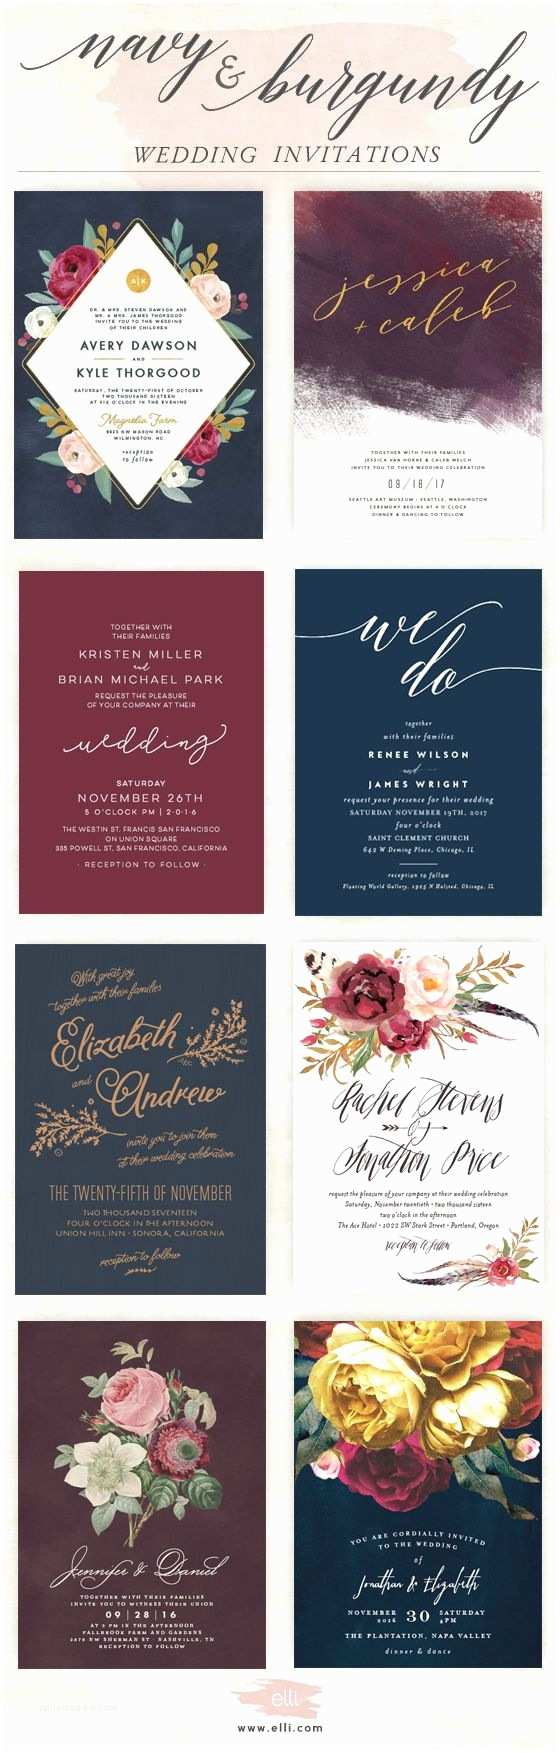 Navy and Burgundy Wedding Invitations Best 25 Burgundy Tie Ideas On Pinterest